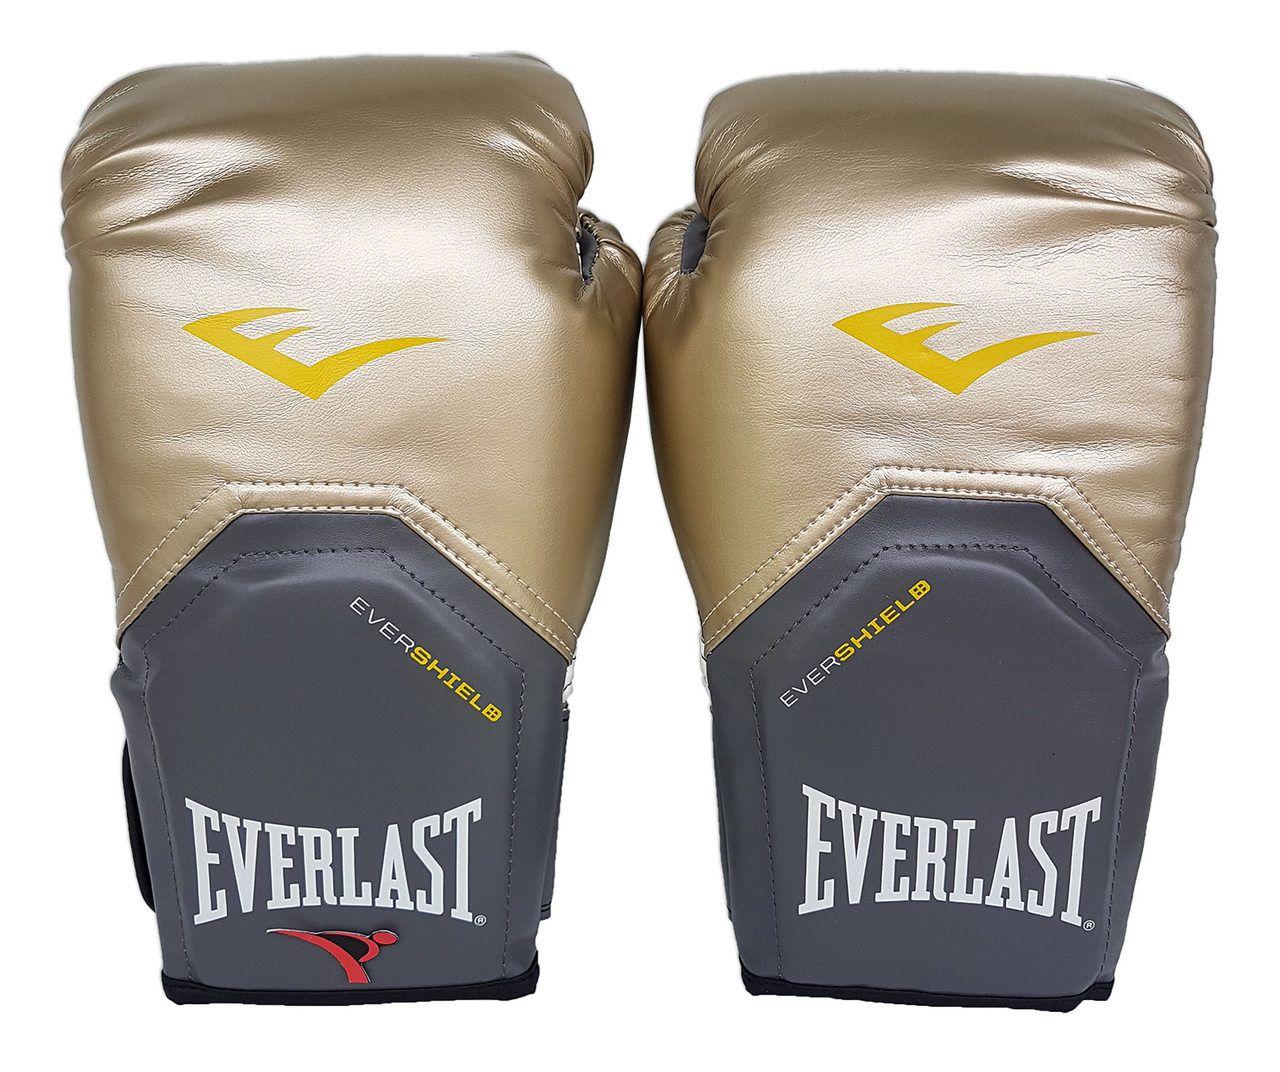 Kit de Boxe / Muay Thai 14oz - Dourado - Pro Style - Everlast  - PRALUTA SHOP